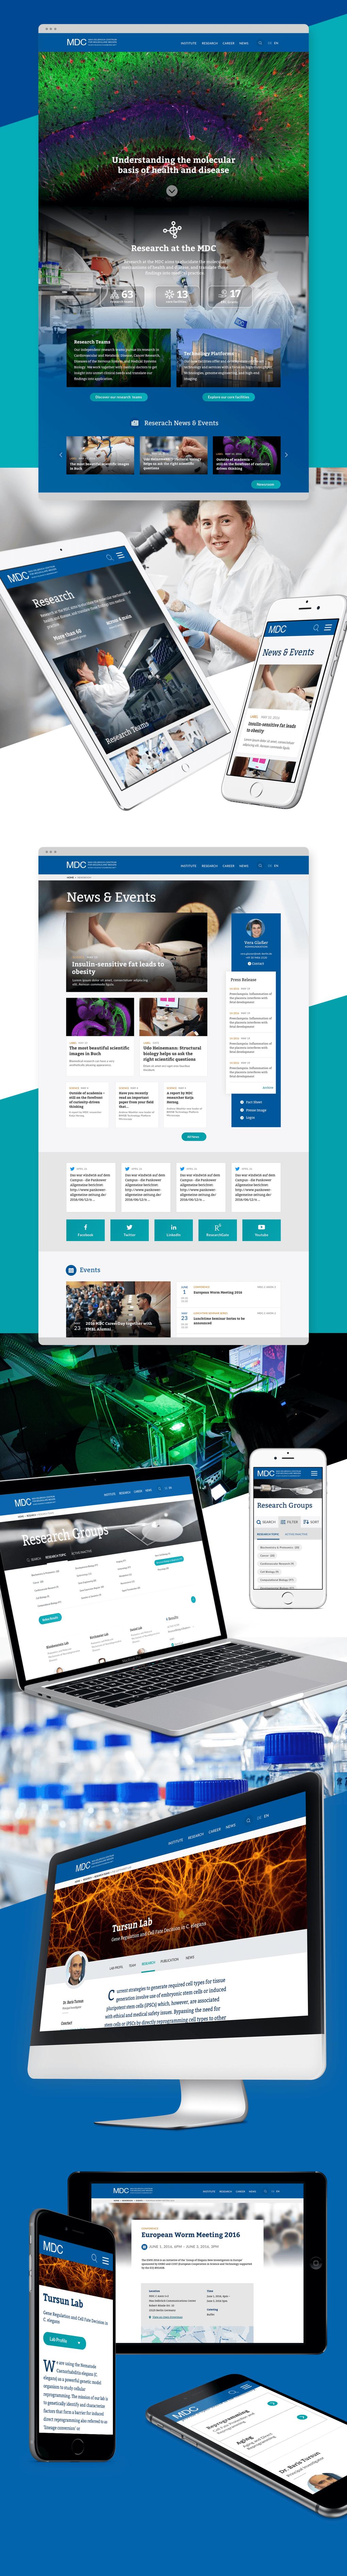 "Projektaufbereitung ""Website Relaunch von mdc-berlin.de"""